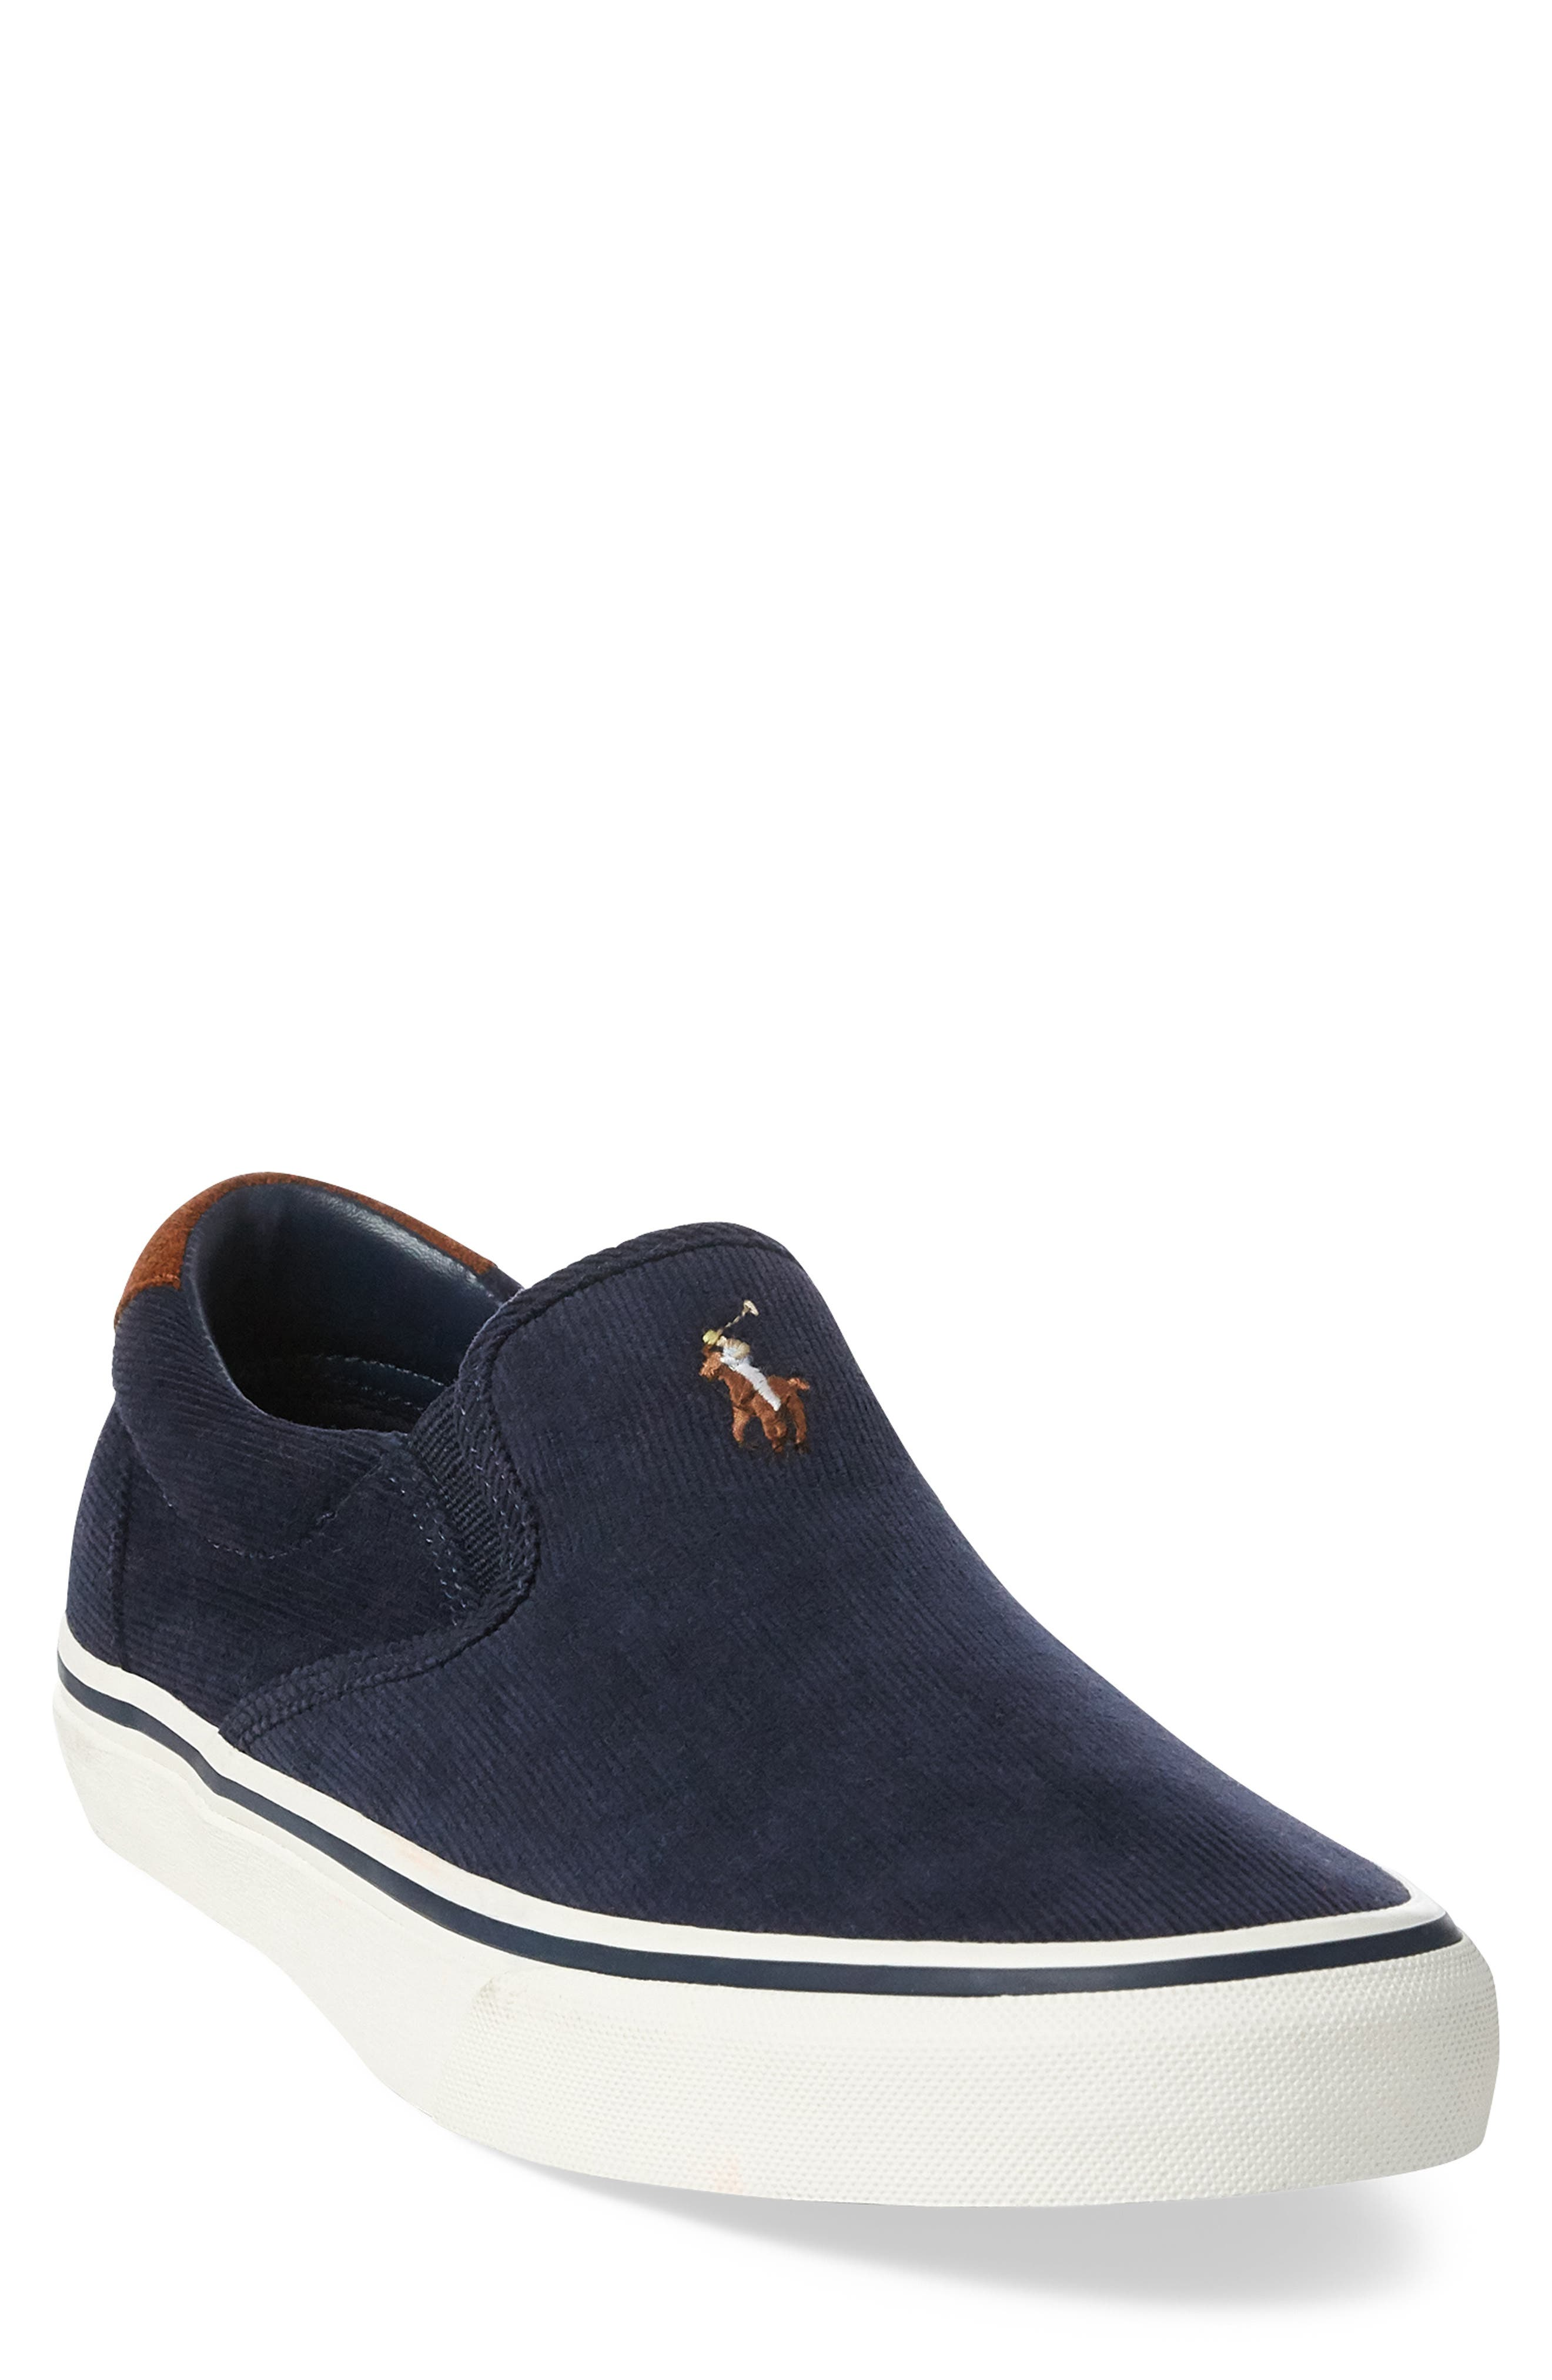 Thompson Corduroy Slip-On Sneaker,                         Main,                         color, NAVY